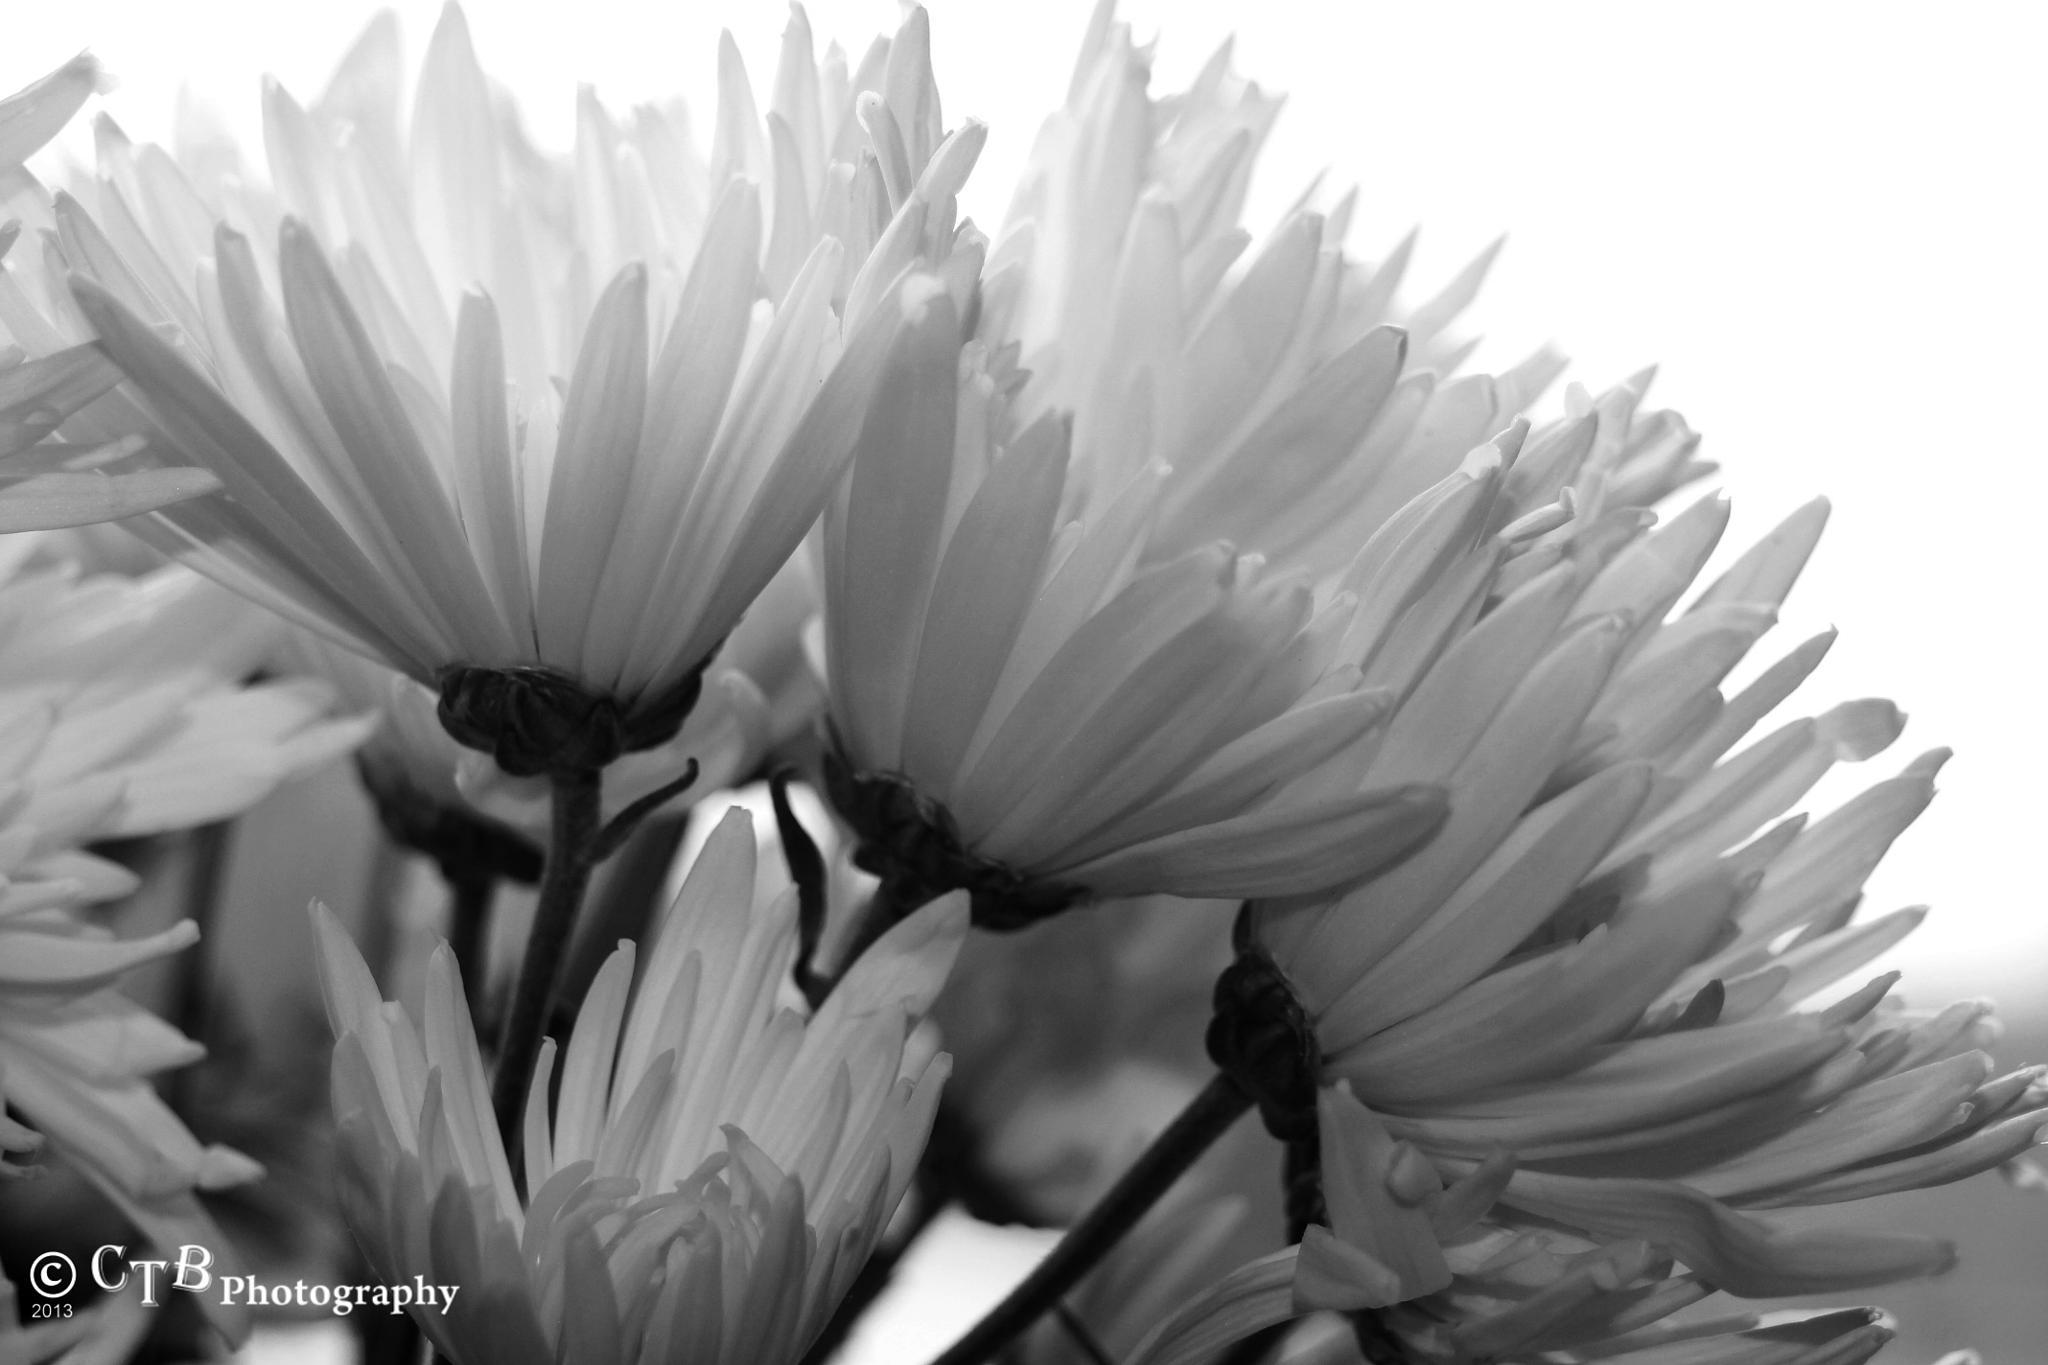 FLOWER PETALS 3 by Carol Thomas Burns